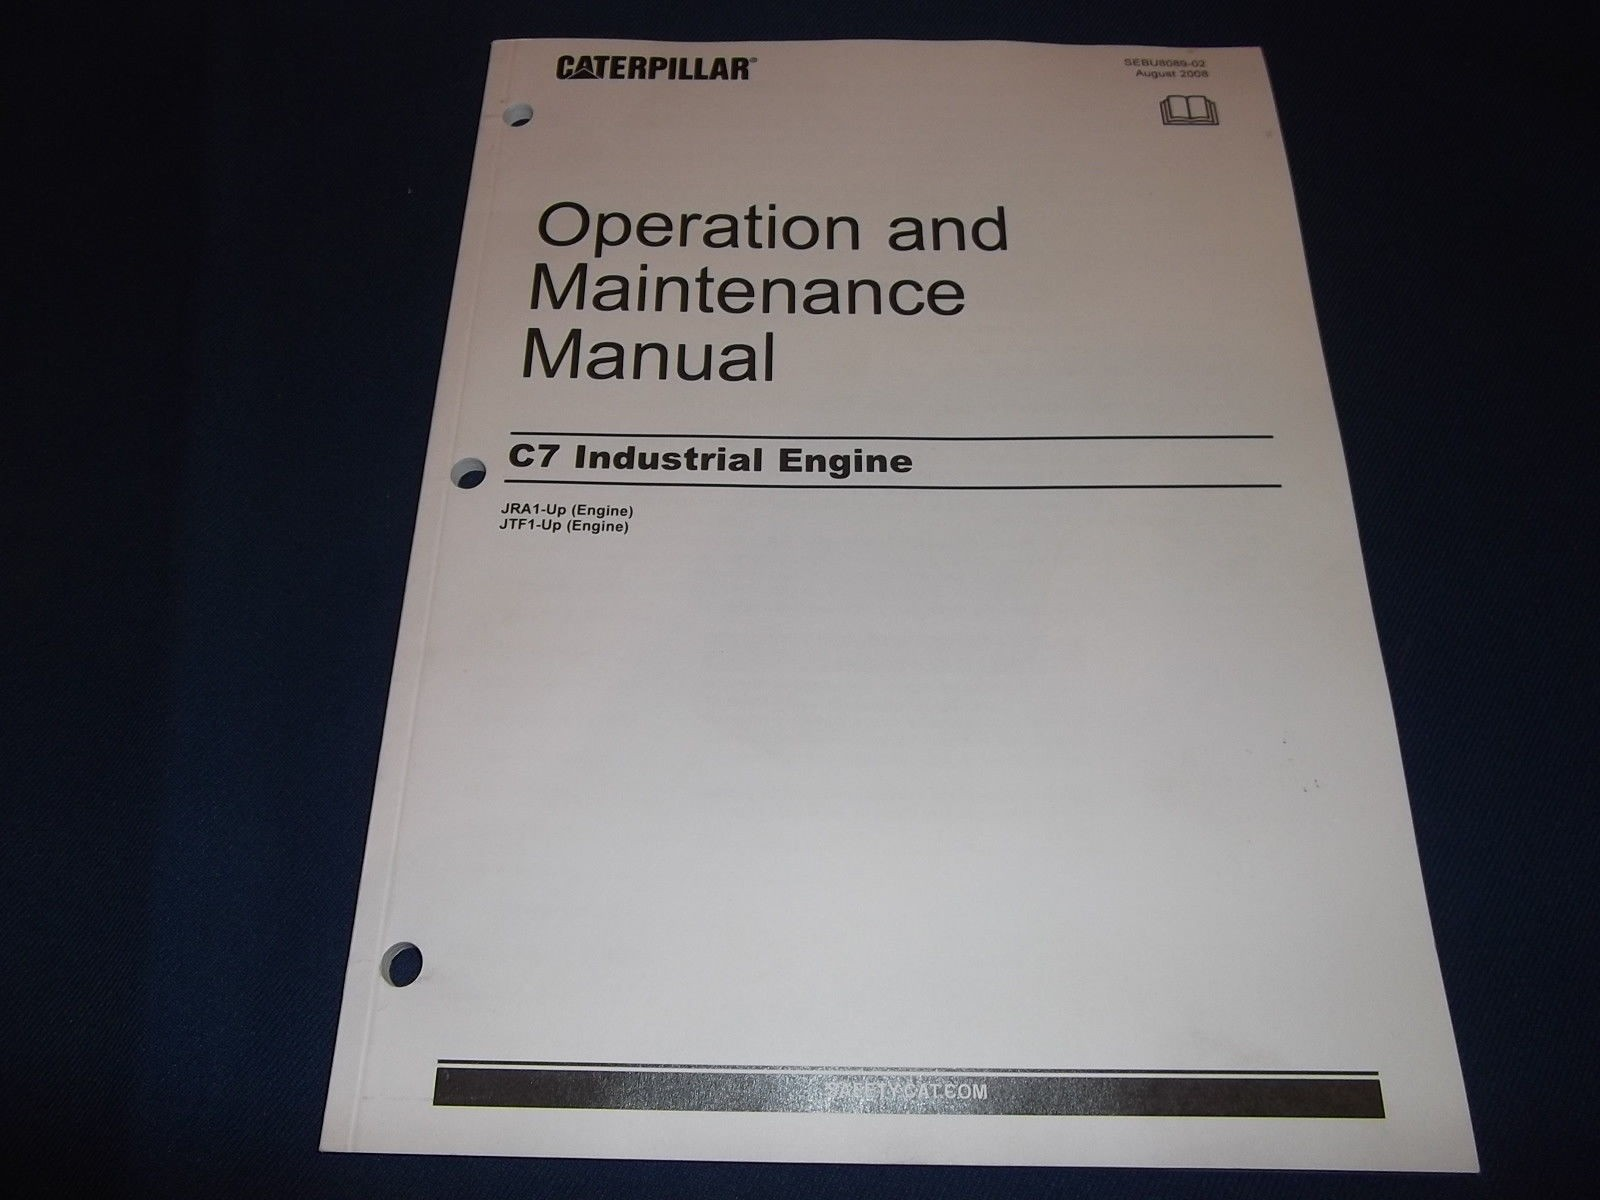 3208 Cat Engine Parts Diagram Cat Caterpillar C7 Industrial Engine Operation & Maintenance Manual Of 3208 Cat Engine Parts Diagram